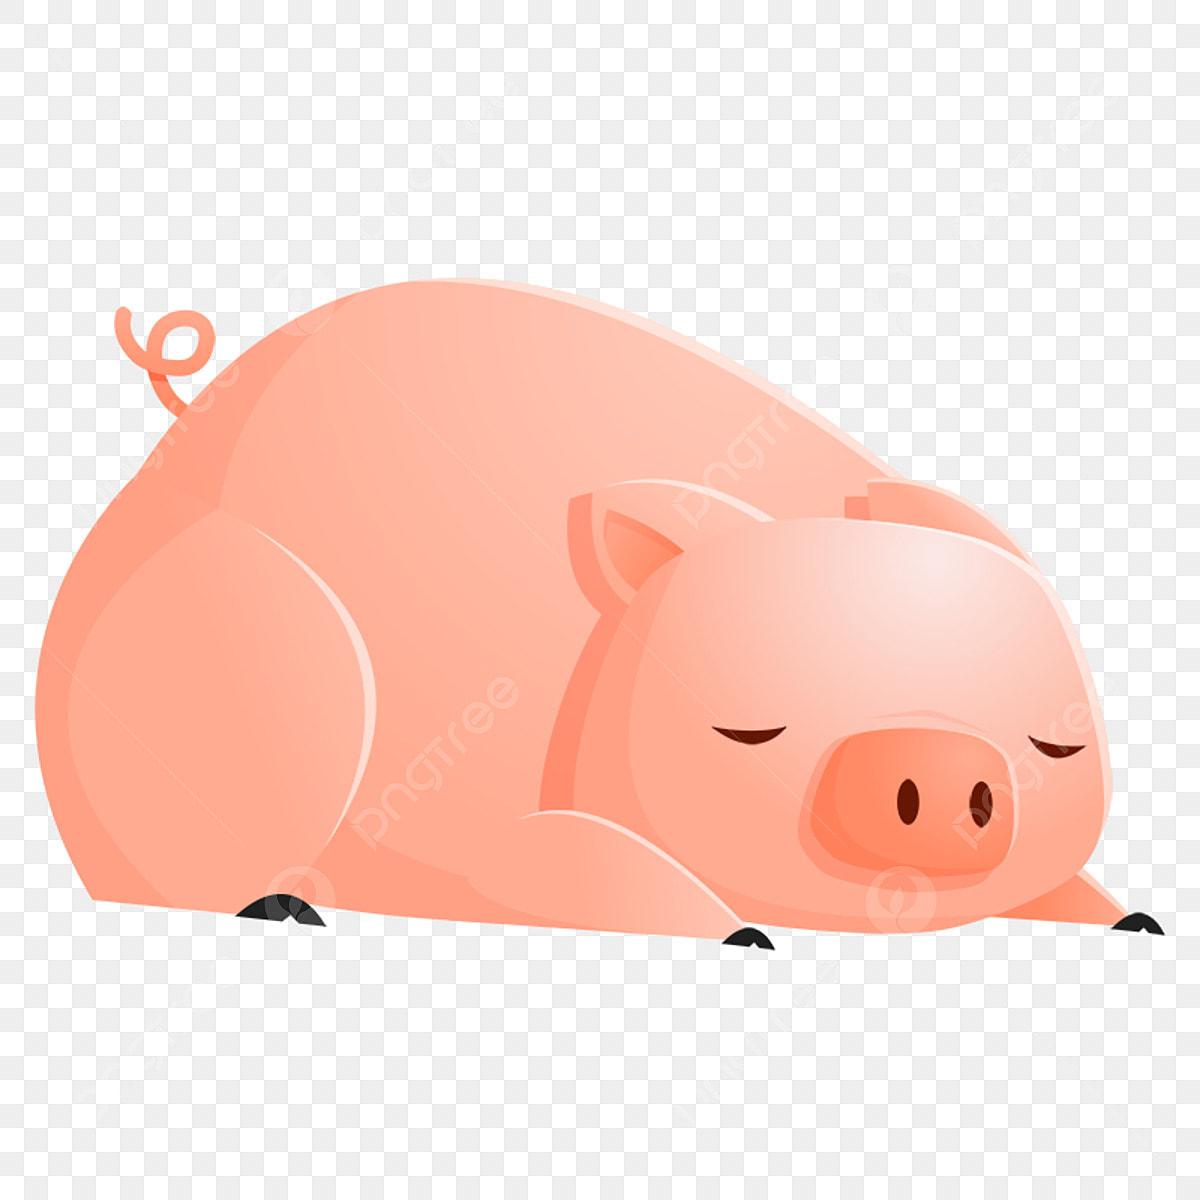 Pig sleeping. Go to bed piggy